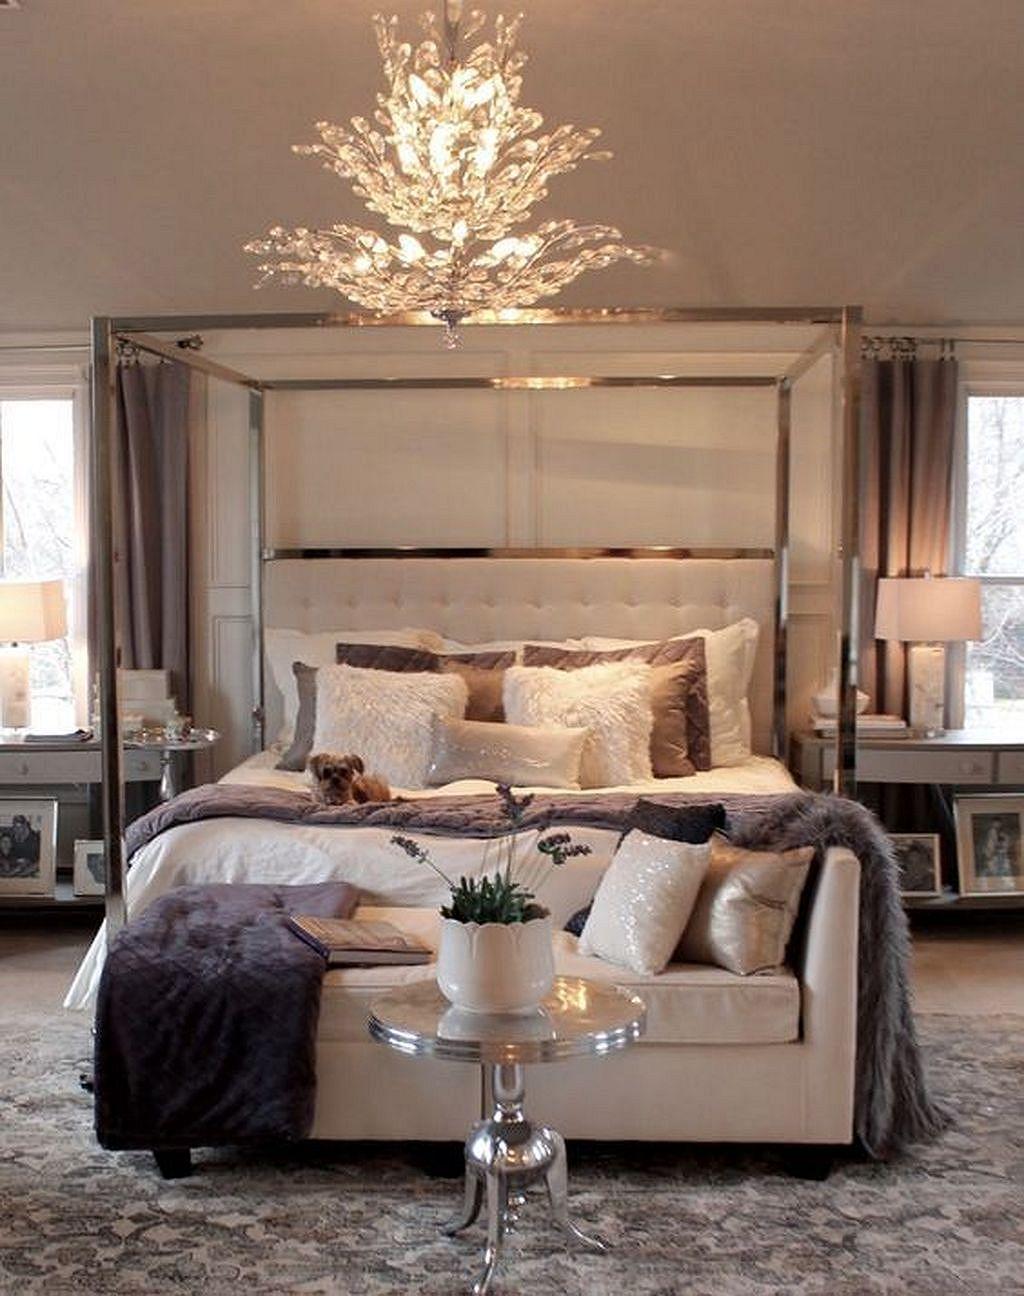 20 Elegant Small Master Bedroom Ideas Decorating - images ... on Master Bedroom Ideas  id=70313